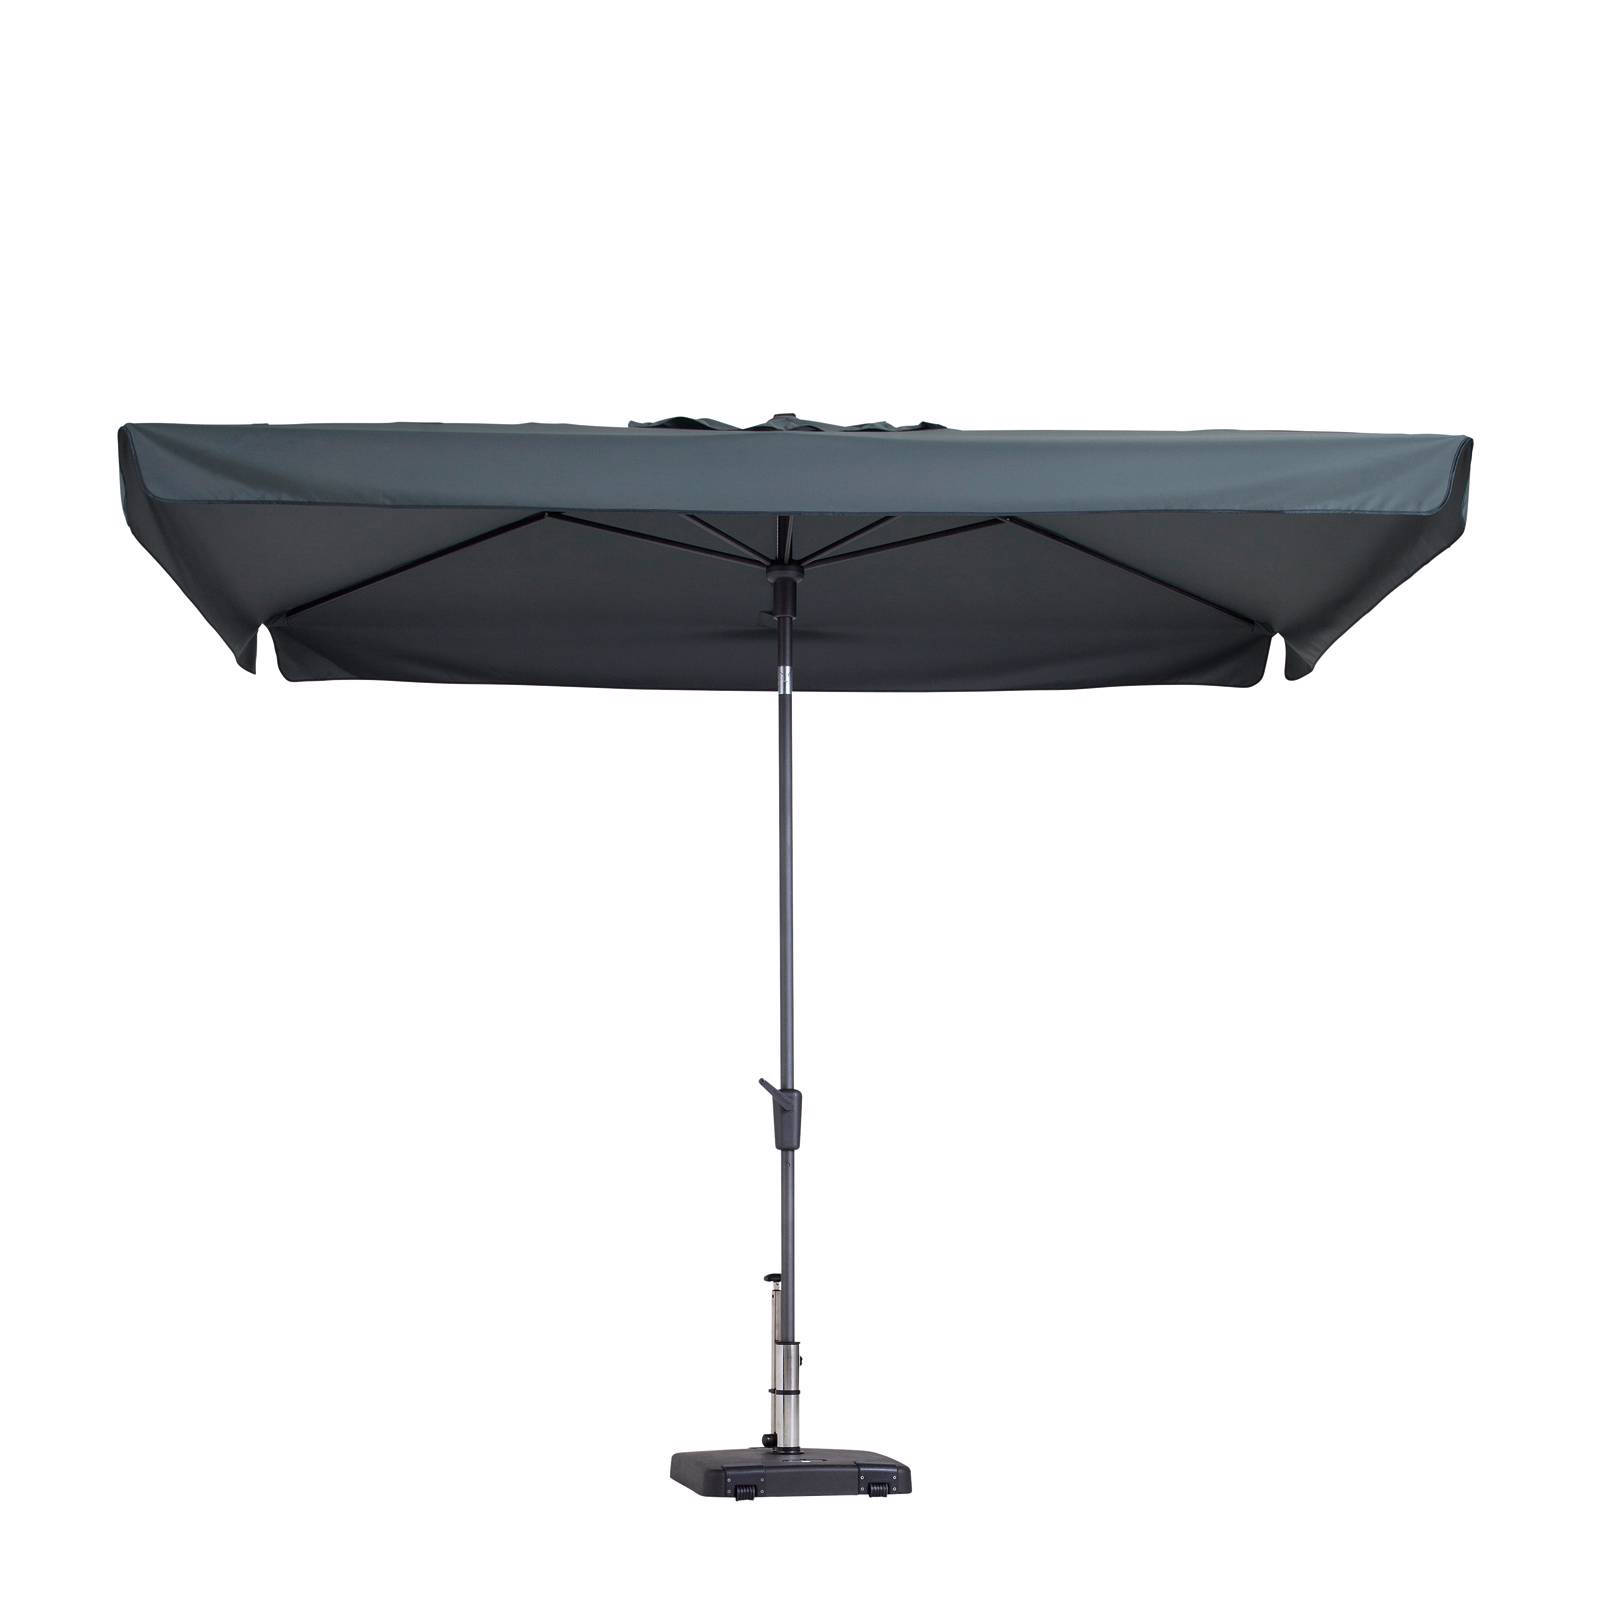 Grote Witte Parasol.Parasols Bij Wehkamp Gratis Bezorging Vanaf 20